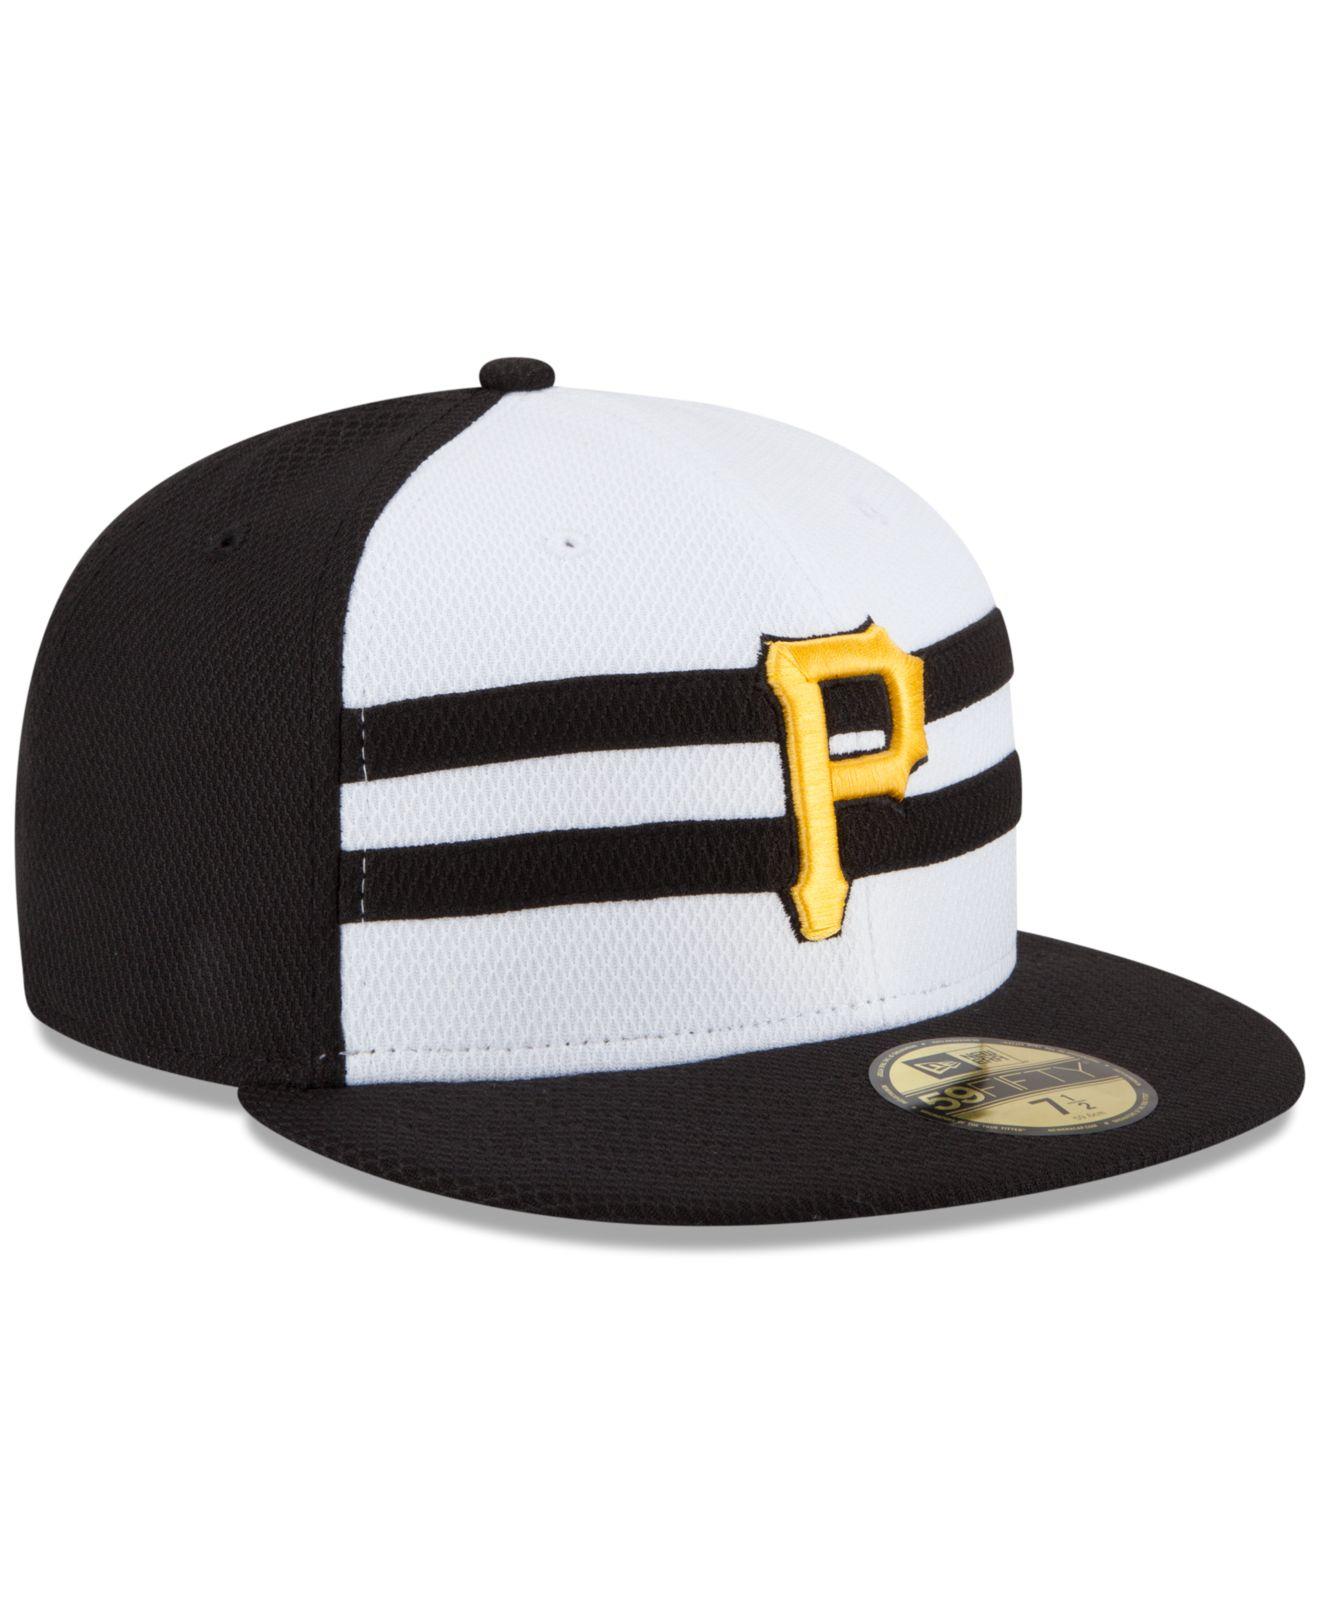 359dd1b5eb7341 ... promo code for lyst ktz pittsburgh pirates 2015 all star game 59fifty  cap in 9cd3b 44b02